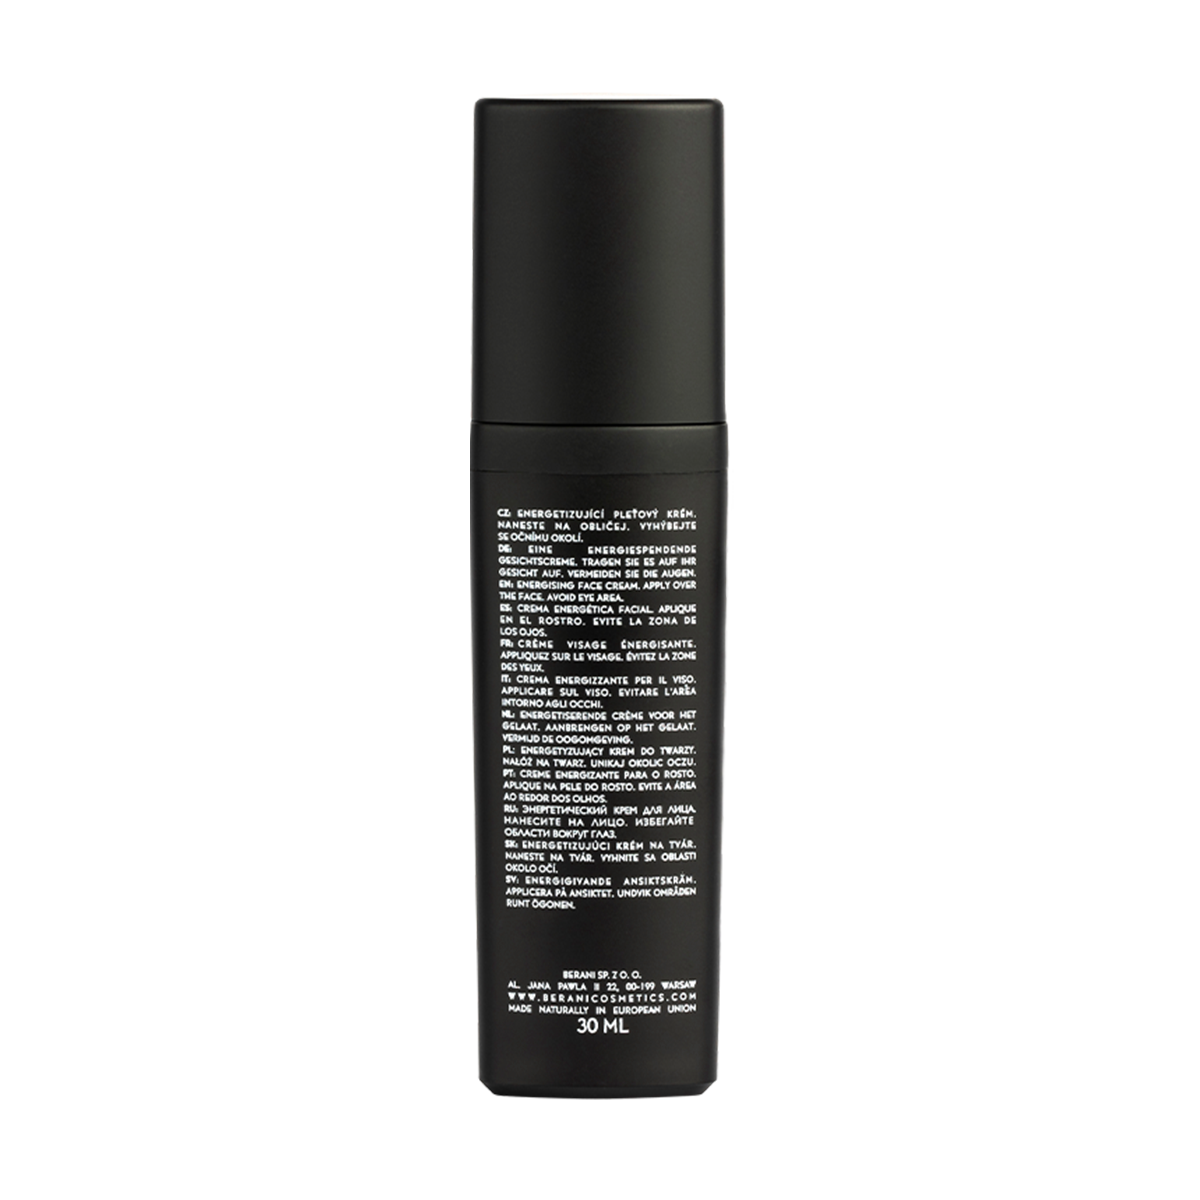 Berani Face Booster - krem do twarzy  - 30 ml